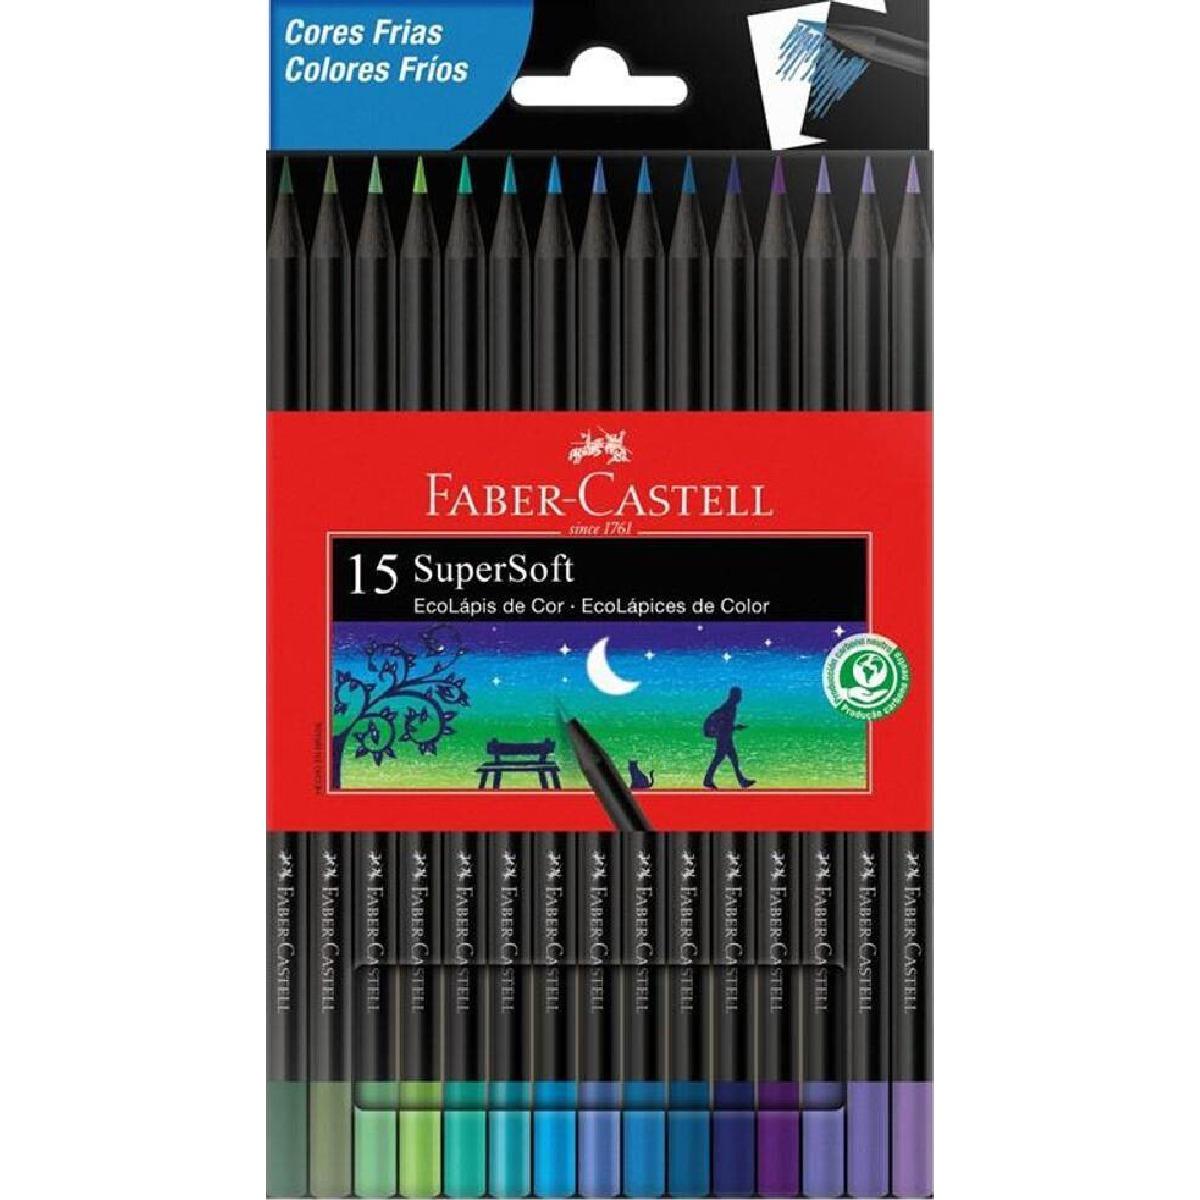 Lápis de Cor Faber Castell SuperSoft 15 Cores Frias